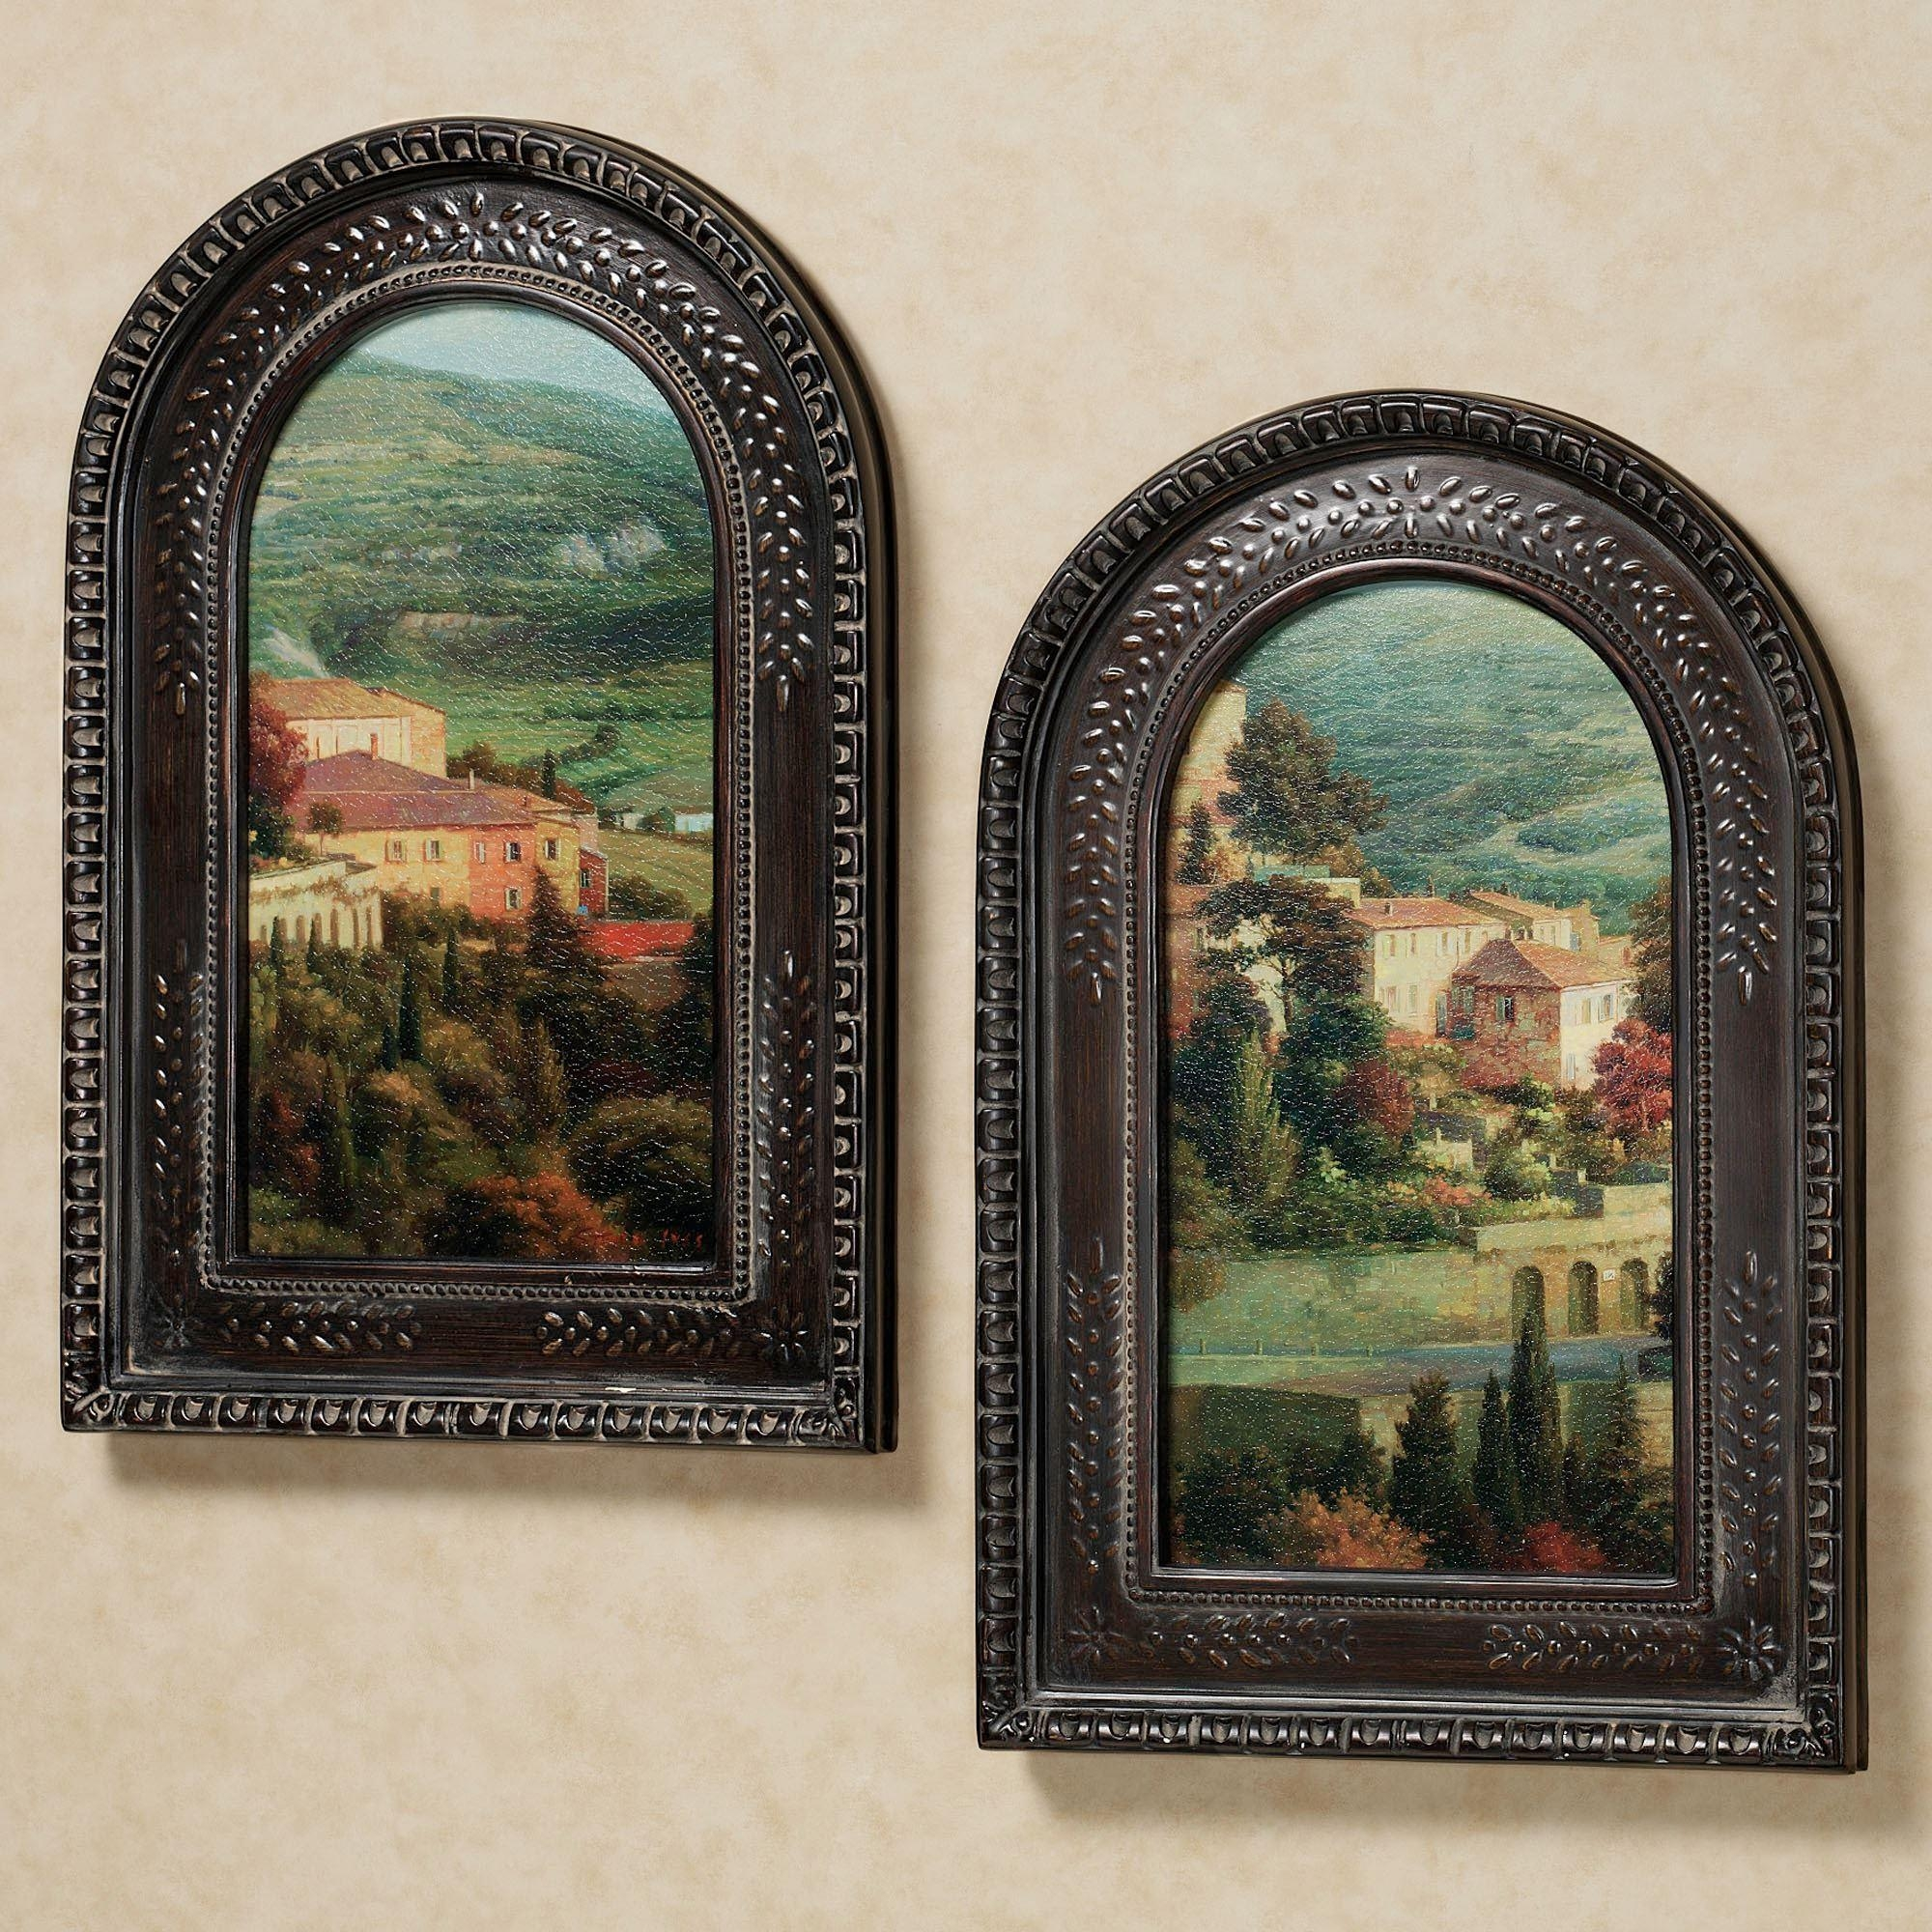 Italian Overlook Framed Wall Art Set Intended For Old Italian Wall Art (Image 5 of 20)